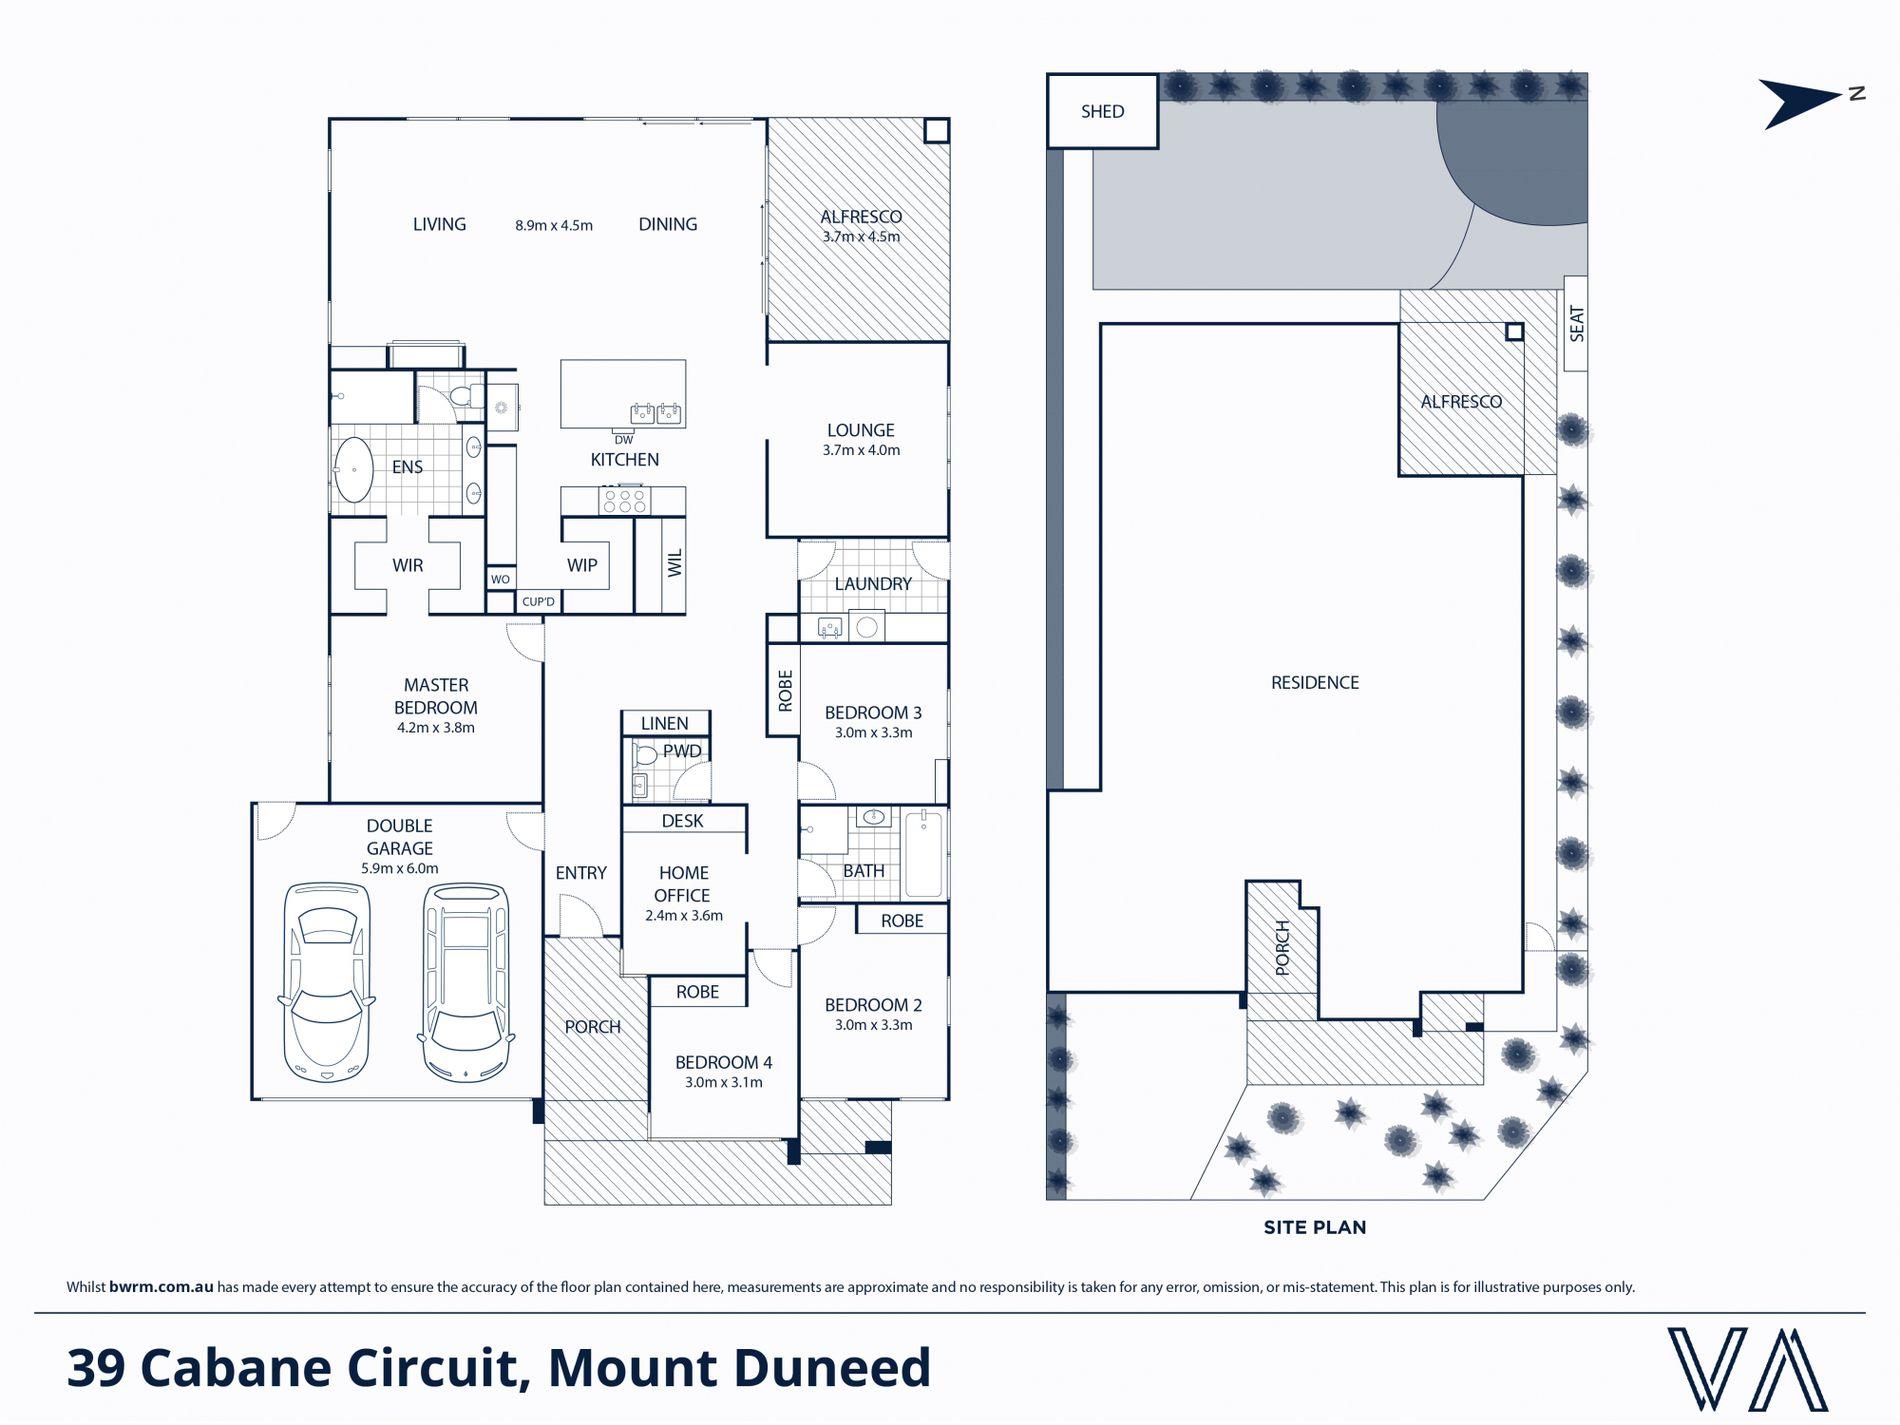 39 Cabane Circuit, Mount Duneed